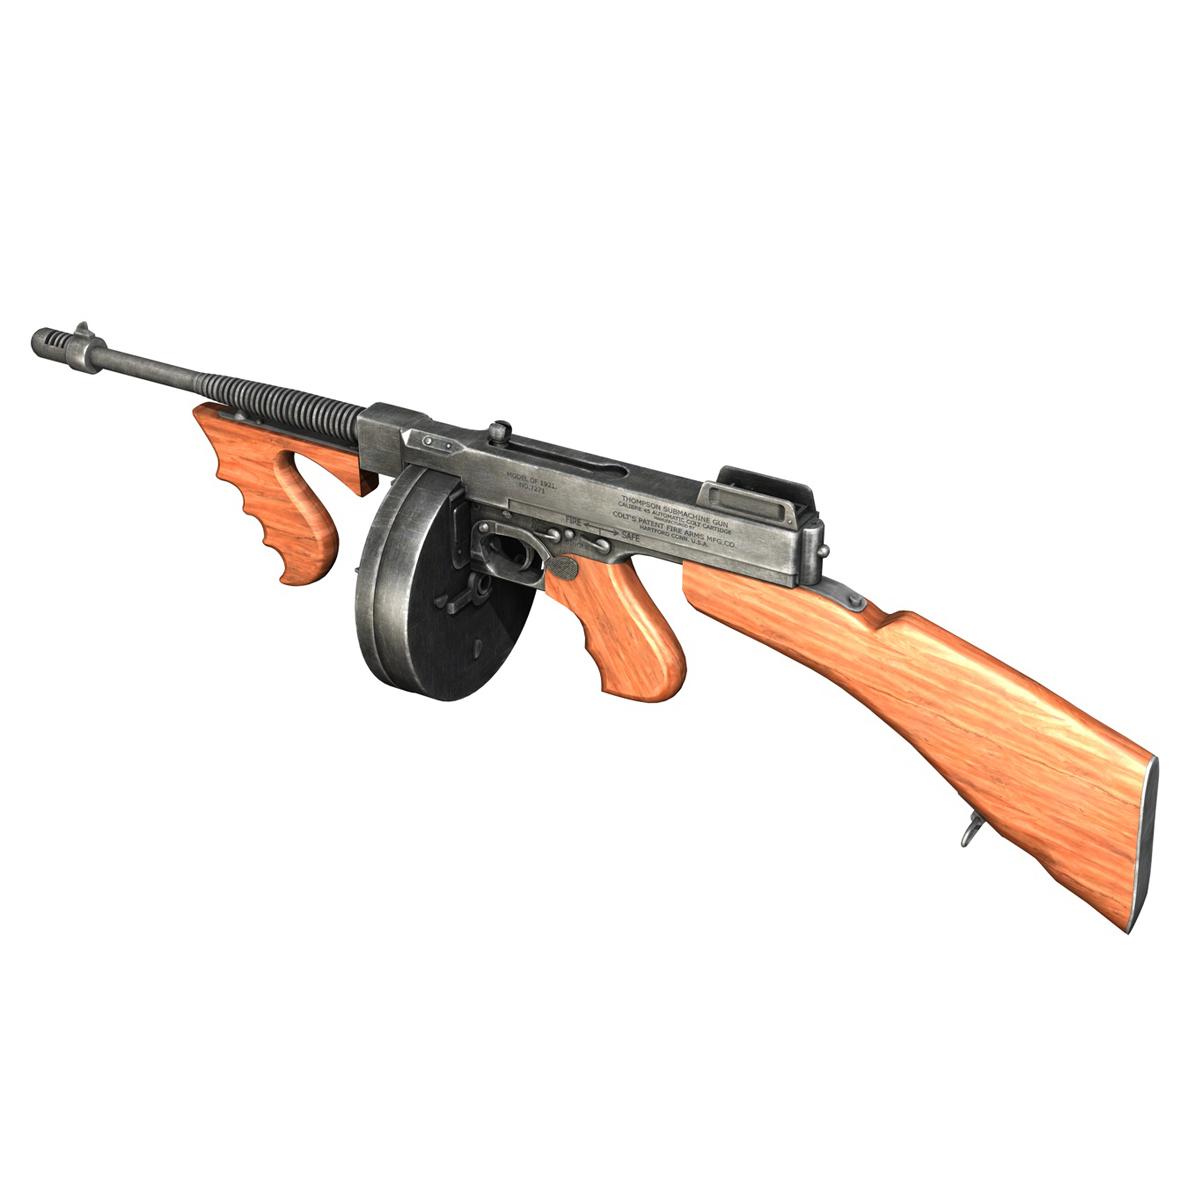 colt model1921 thompson submachine gun 3d model 3ds c4d lwo obj 264709